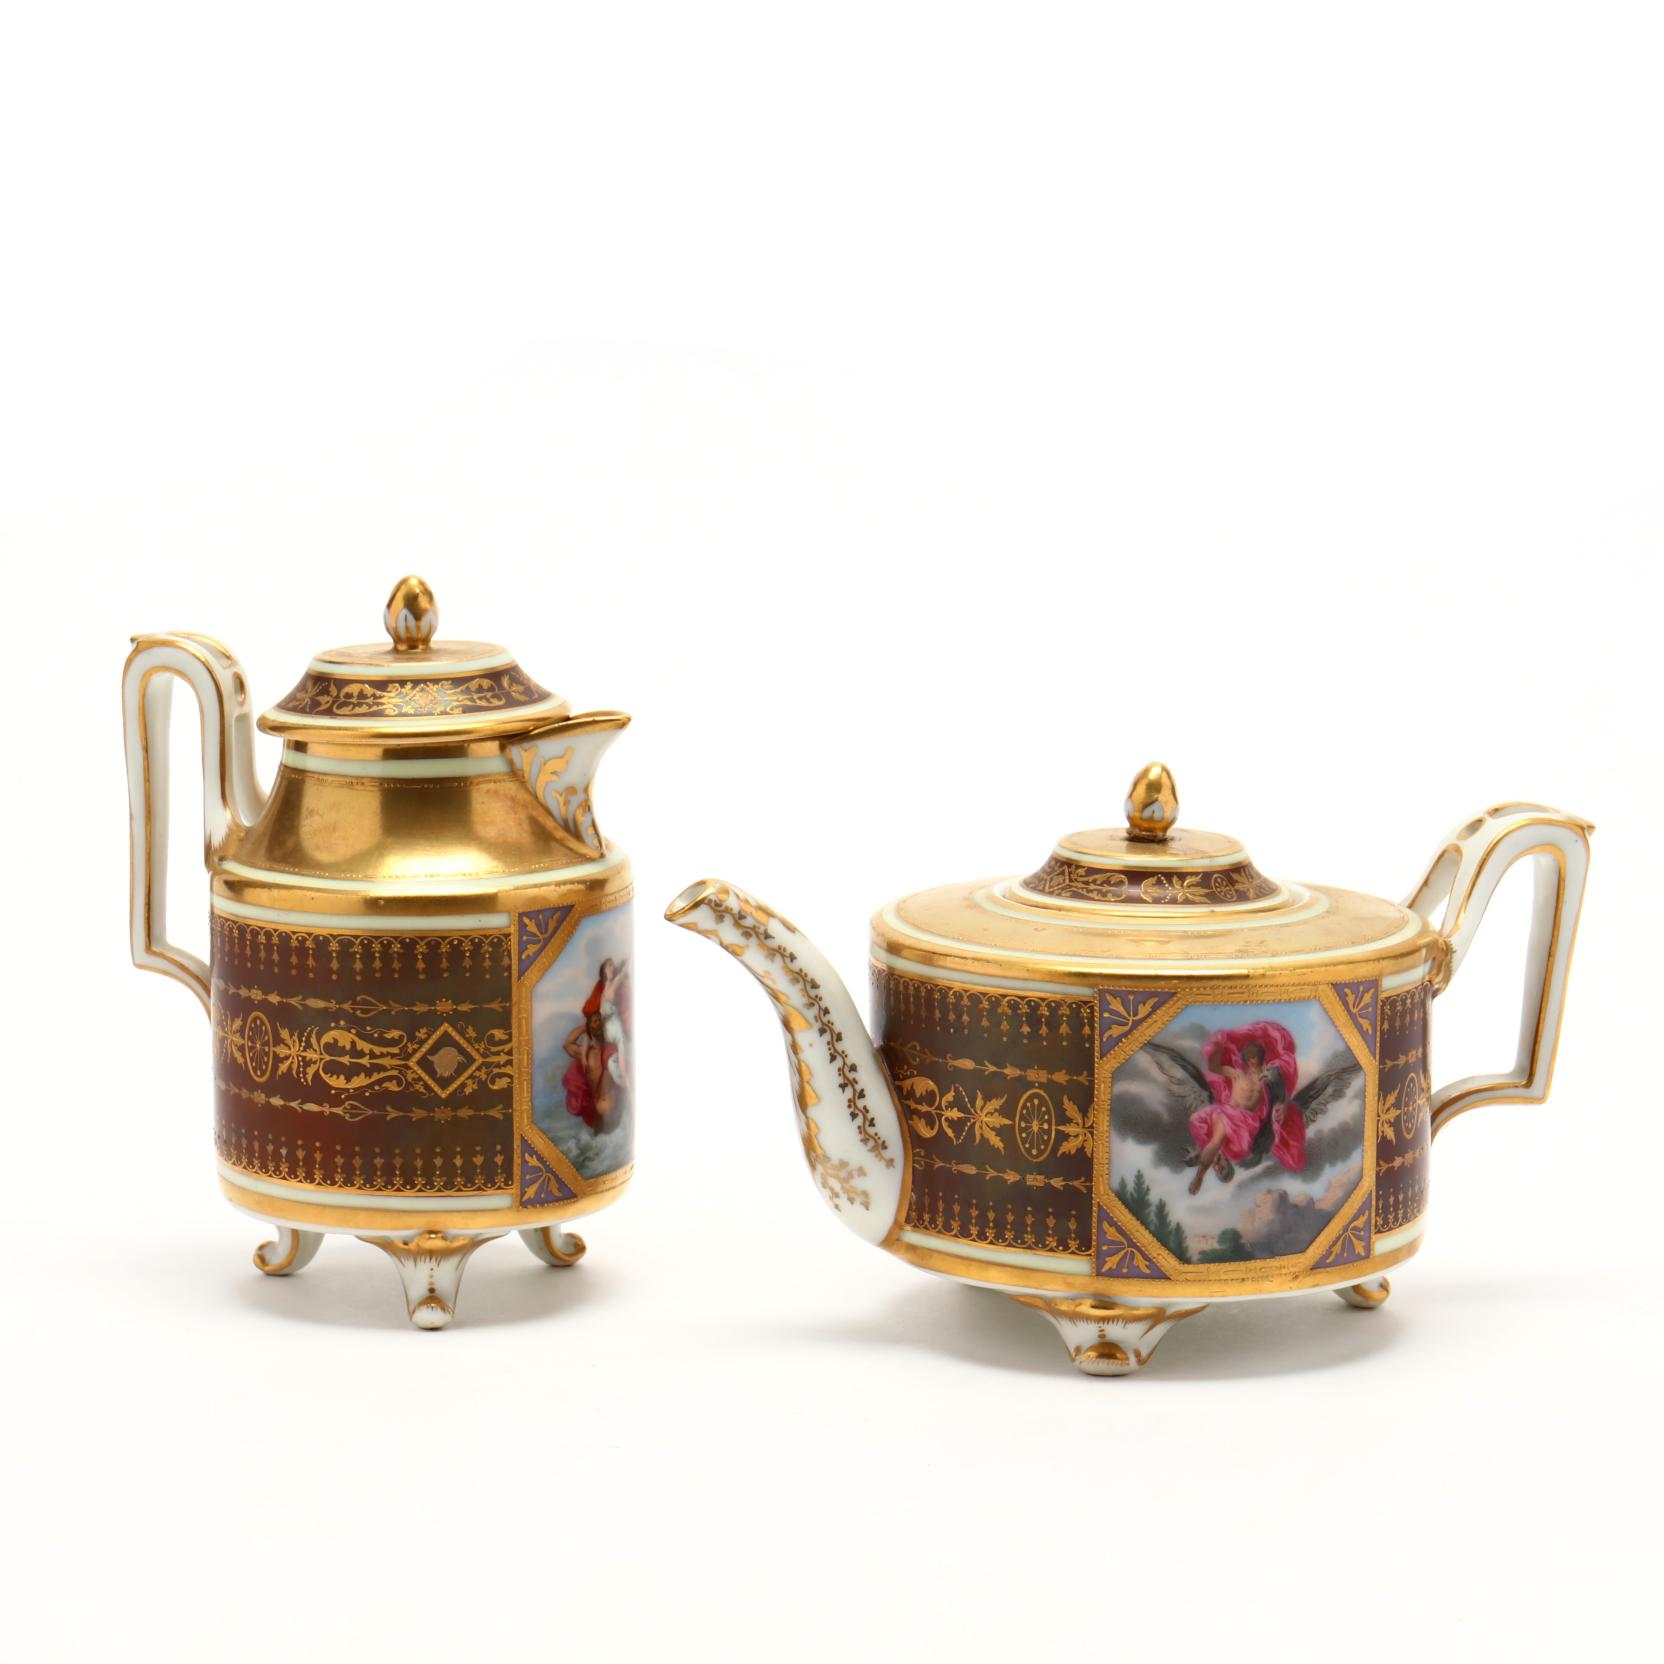 a-royal-vienna-porcelain-sugar-and-cream-jug